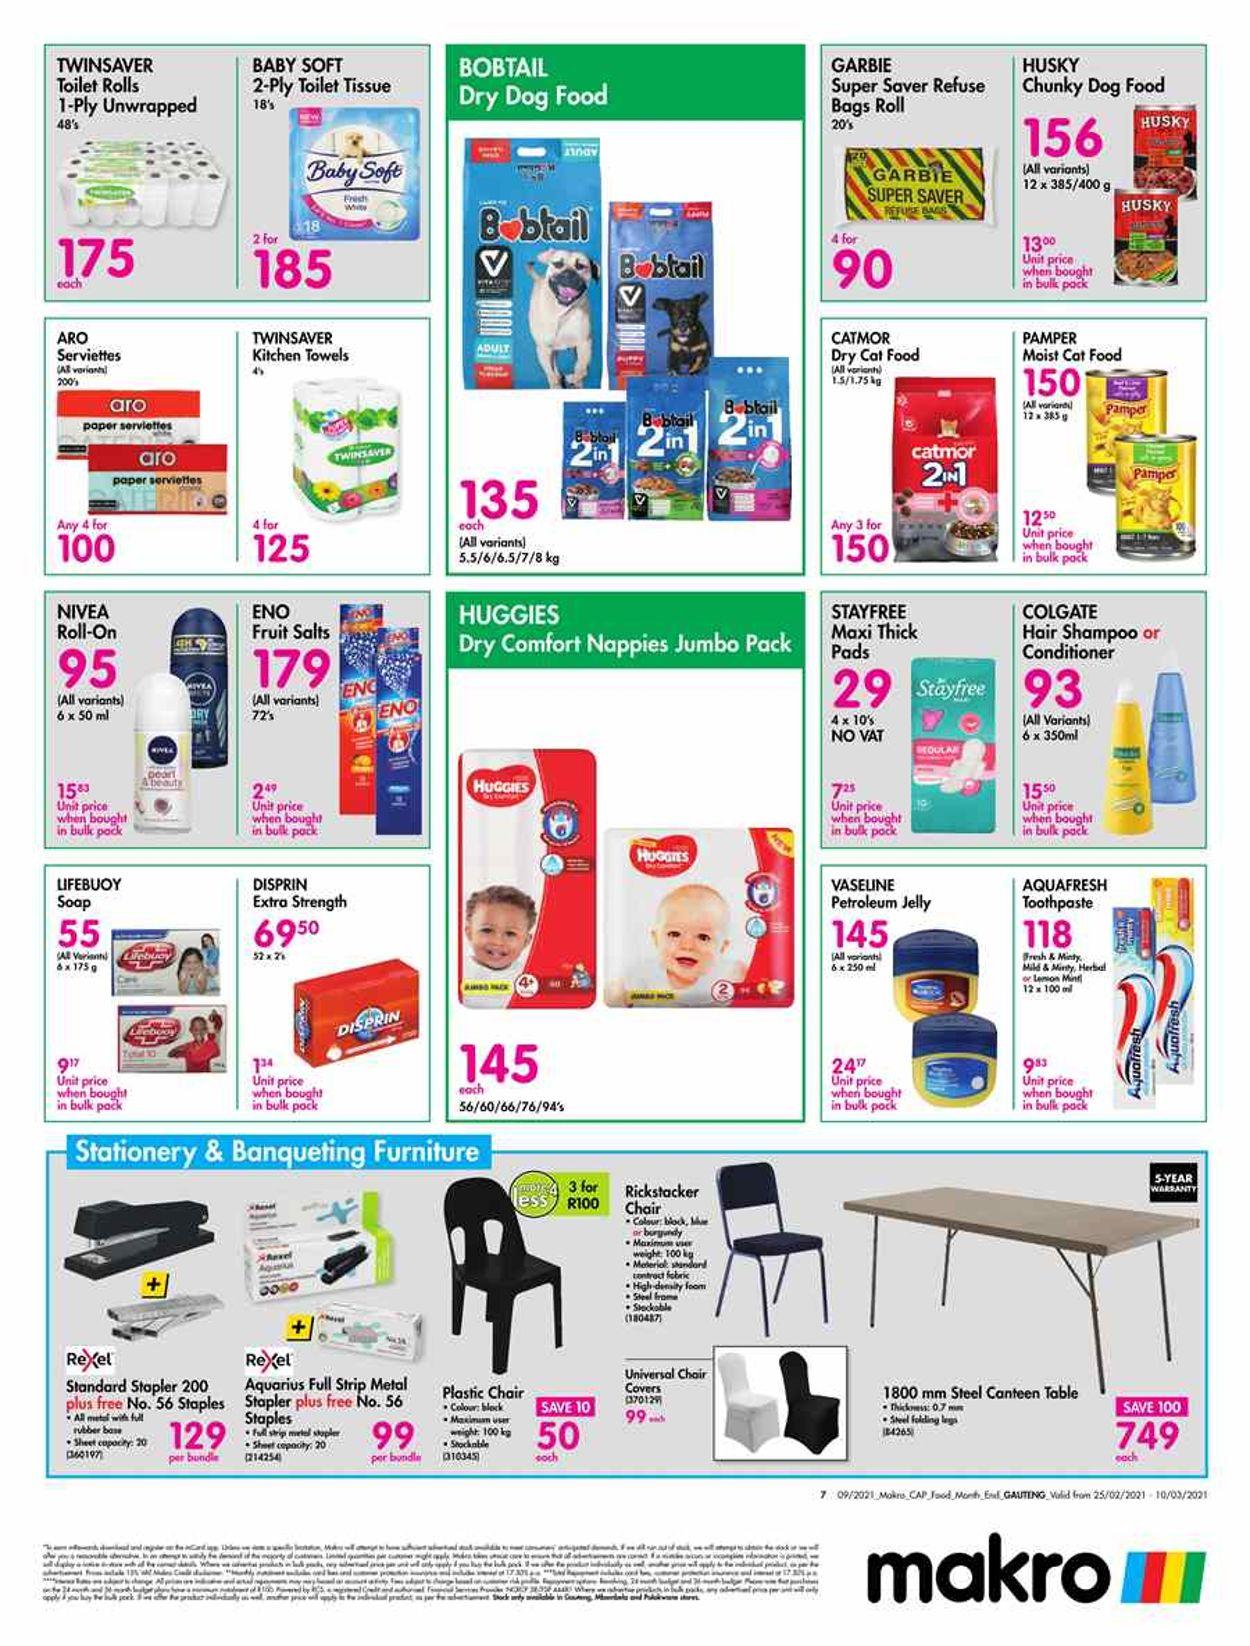 Makro Catalogue - 2021/02/25-2021/03/10 (Page 7)